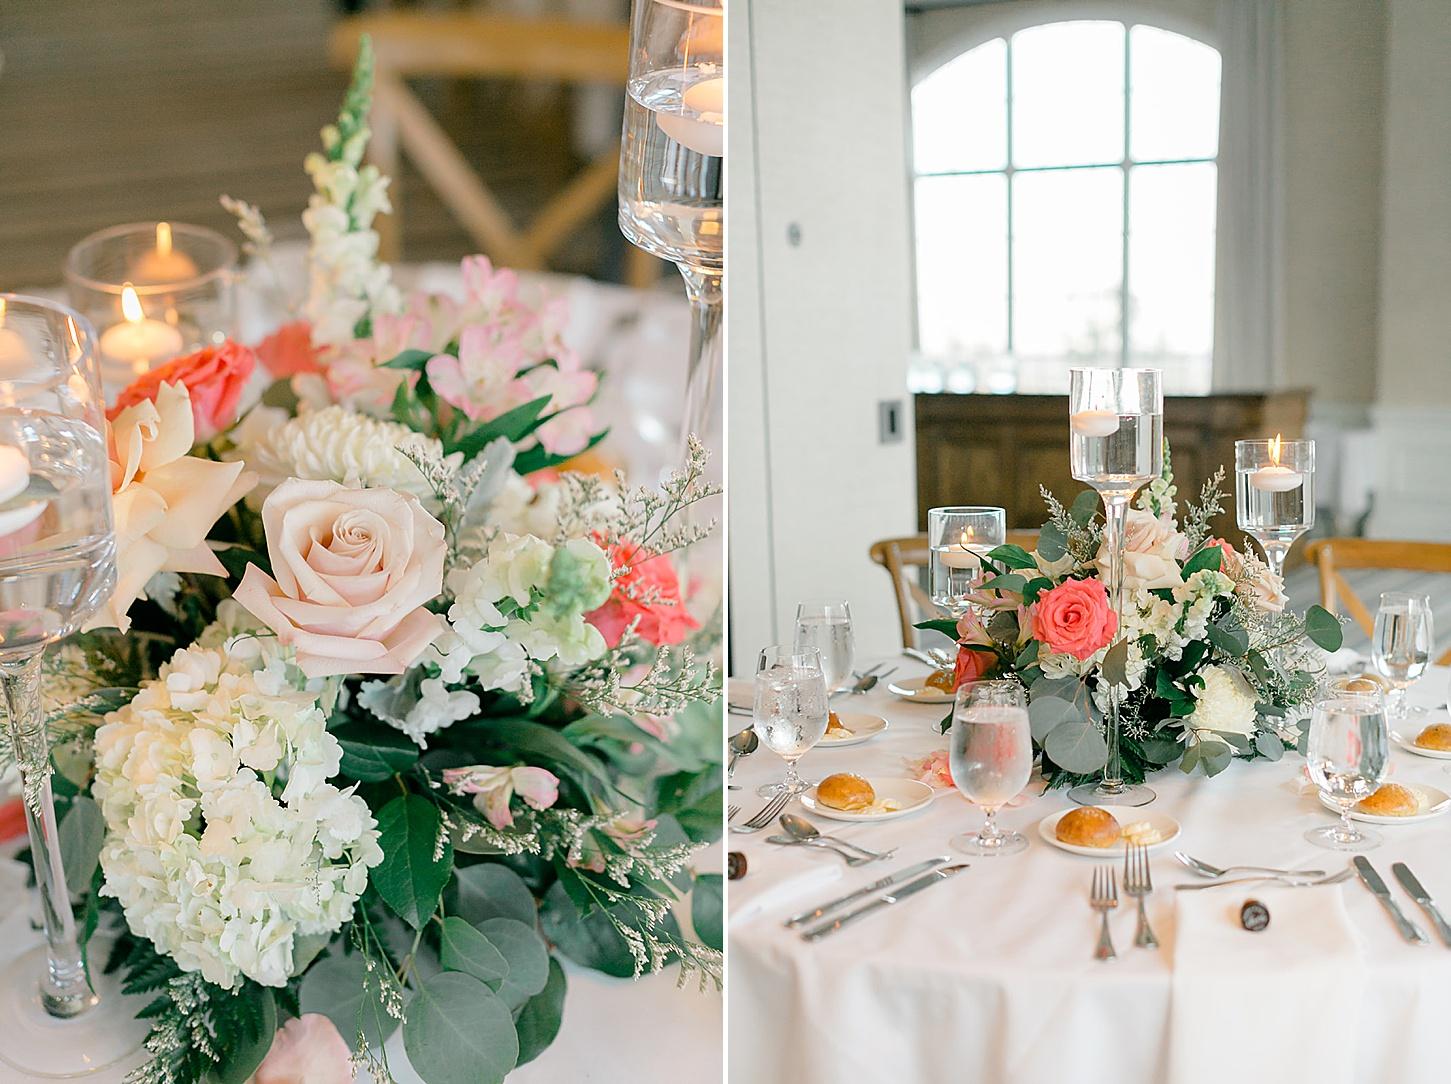 Linwood Country Club Summer Wedding Photography Studio by Magdalena Studios Jenn Kyle 0052